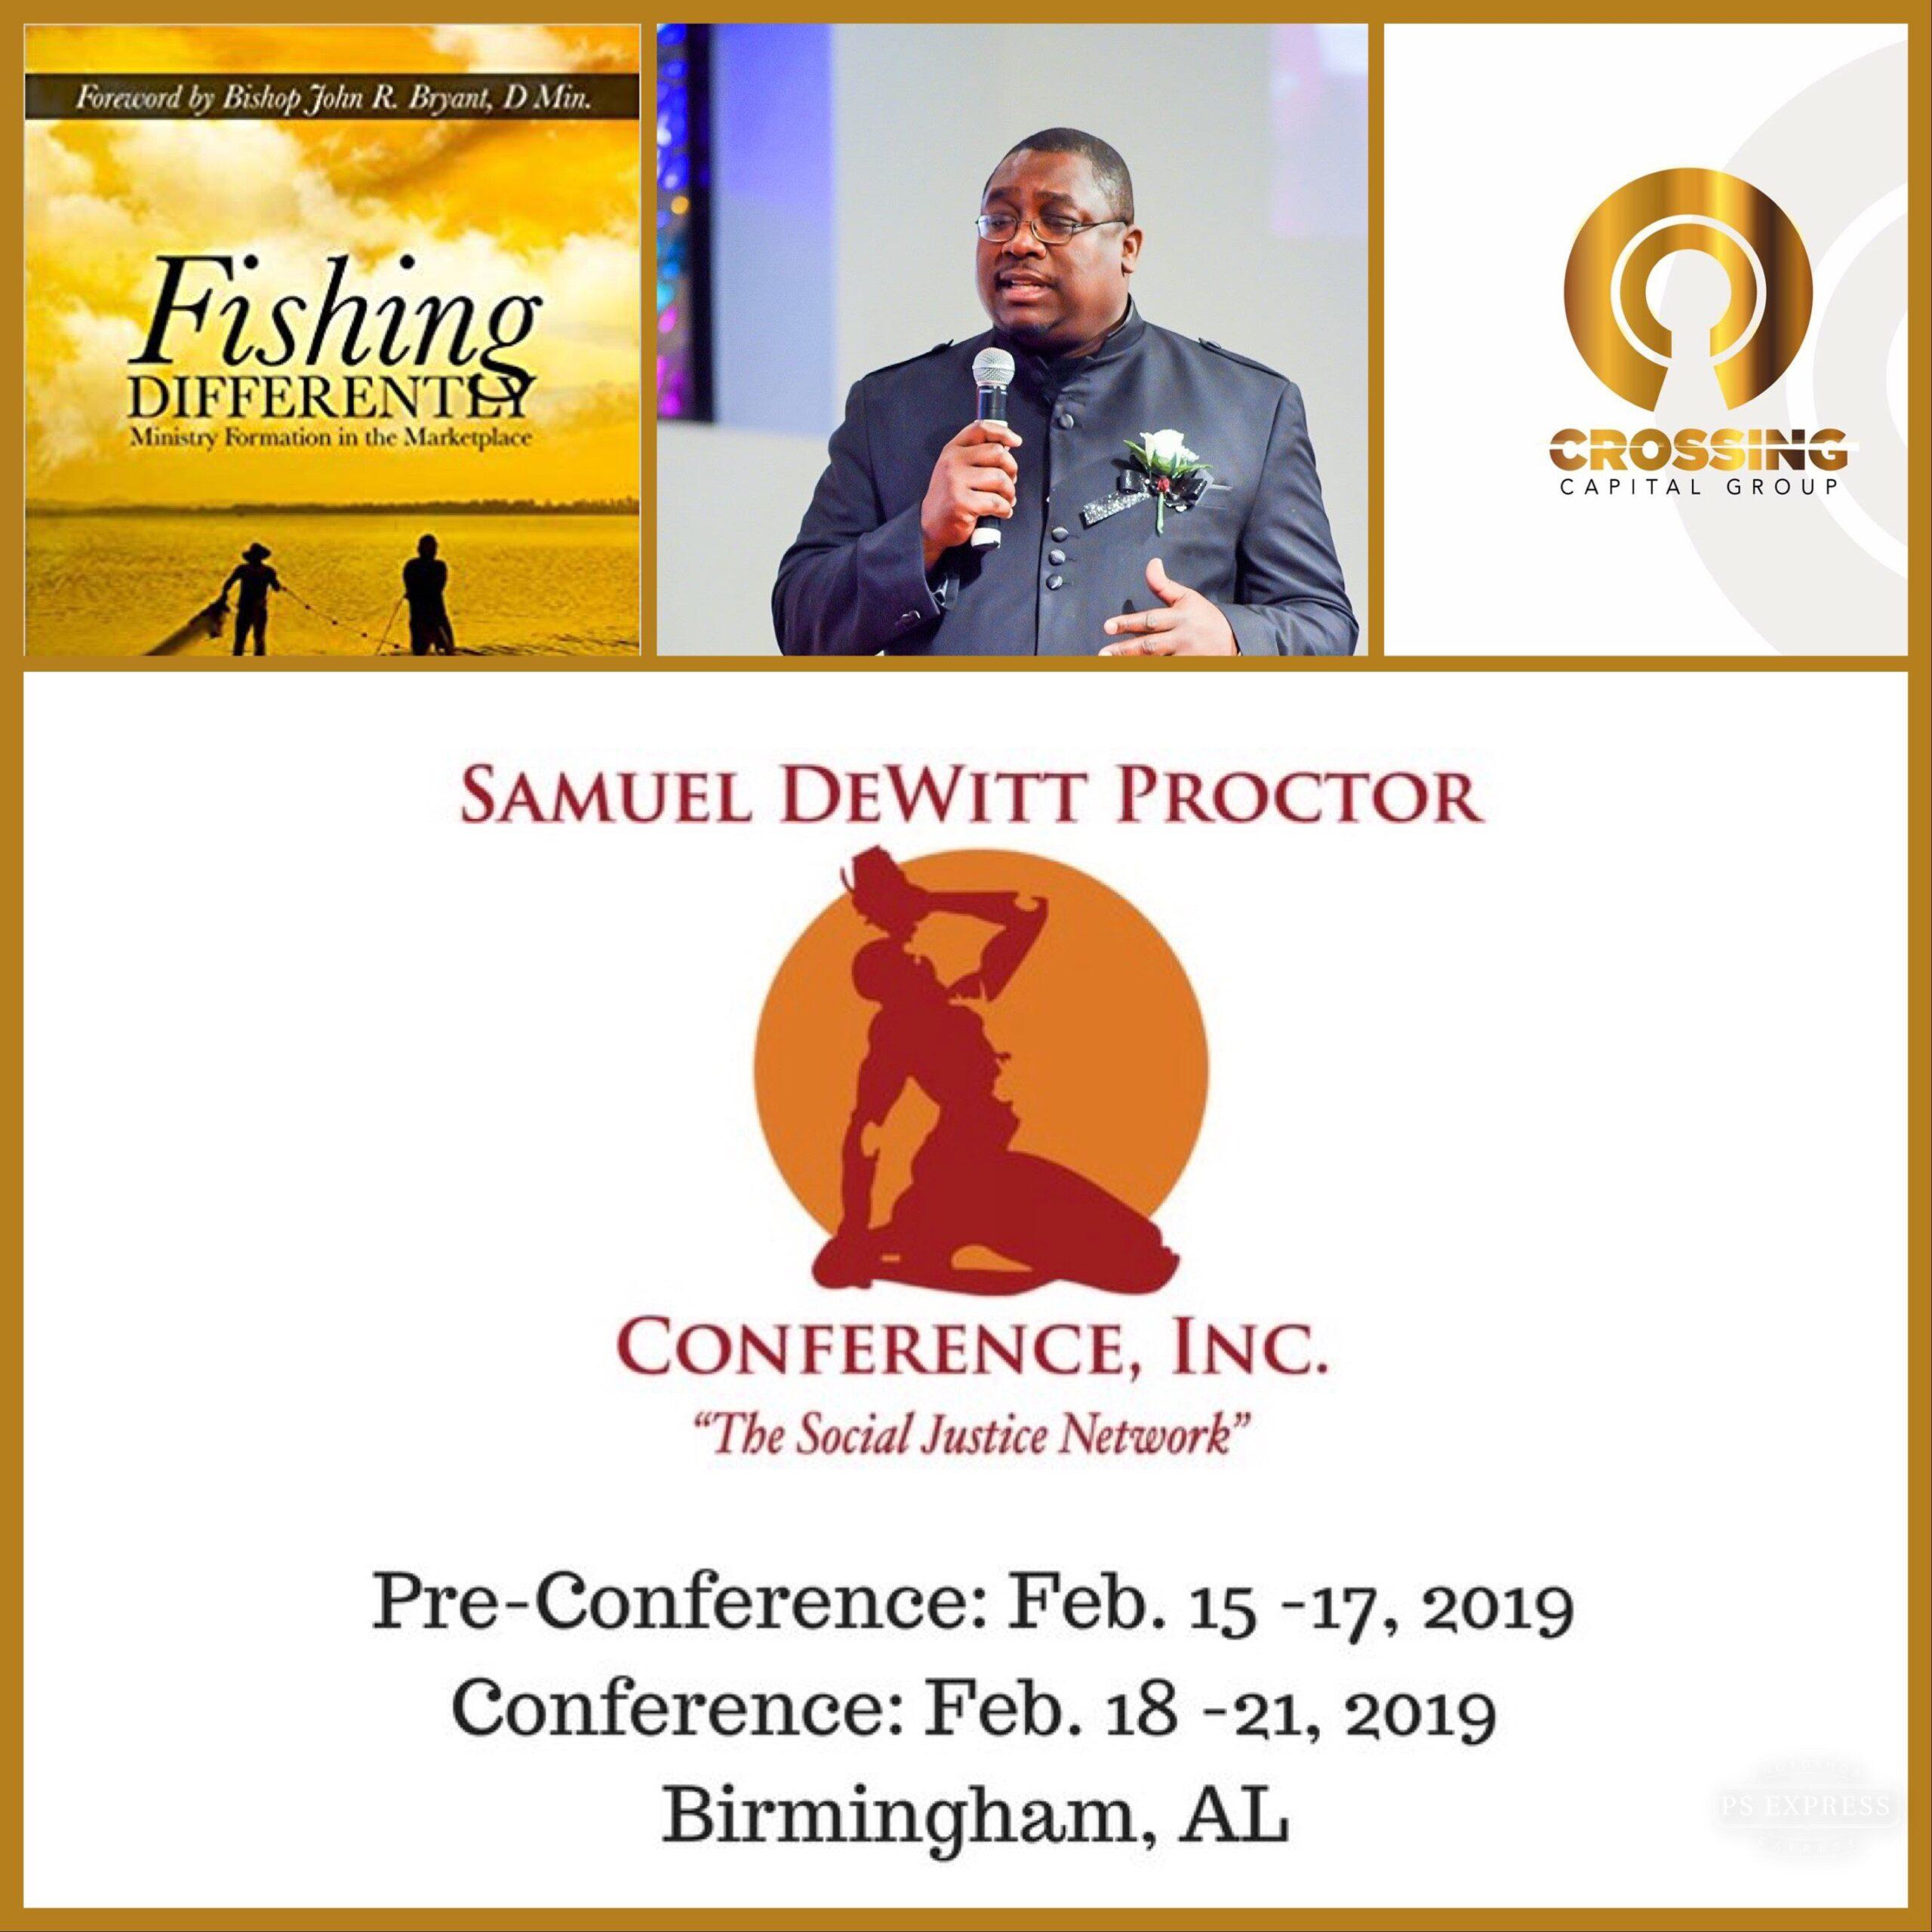 Sidney Williams Samuel DeWitt Proctor Conference